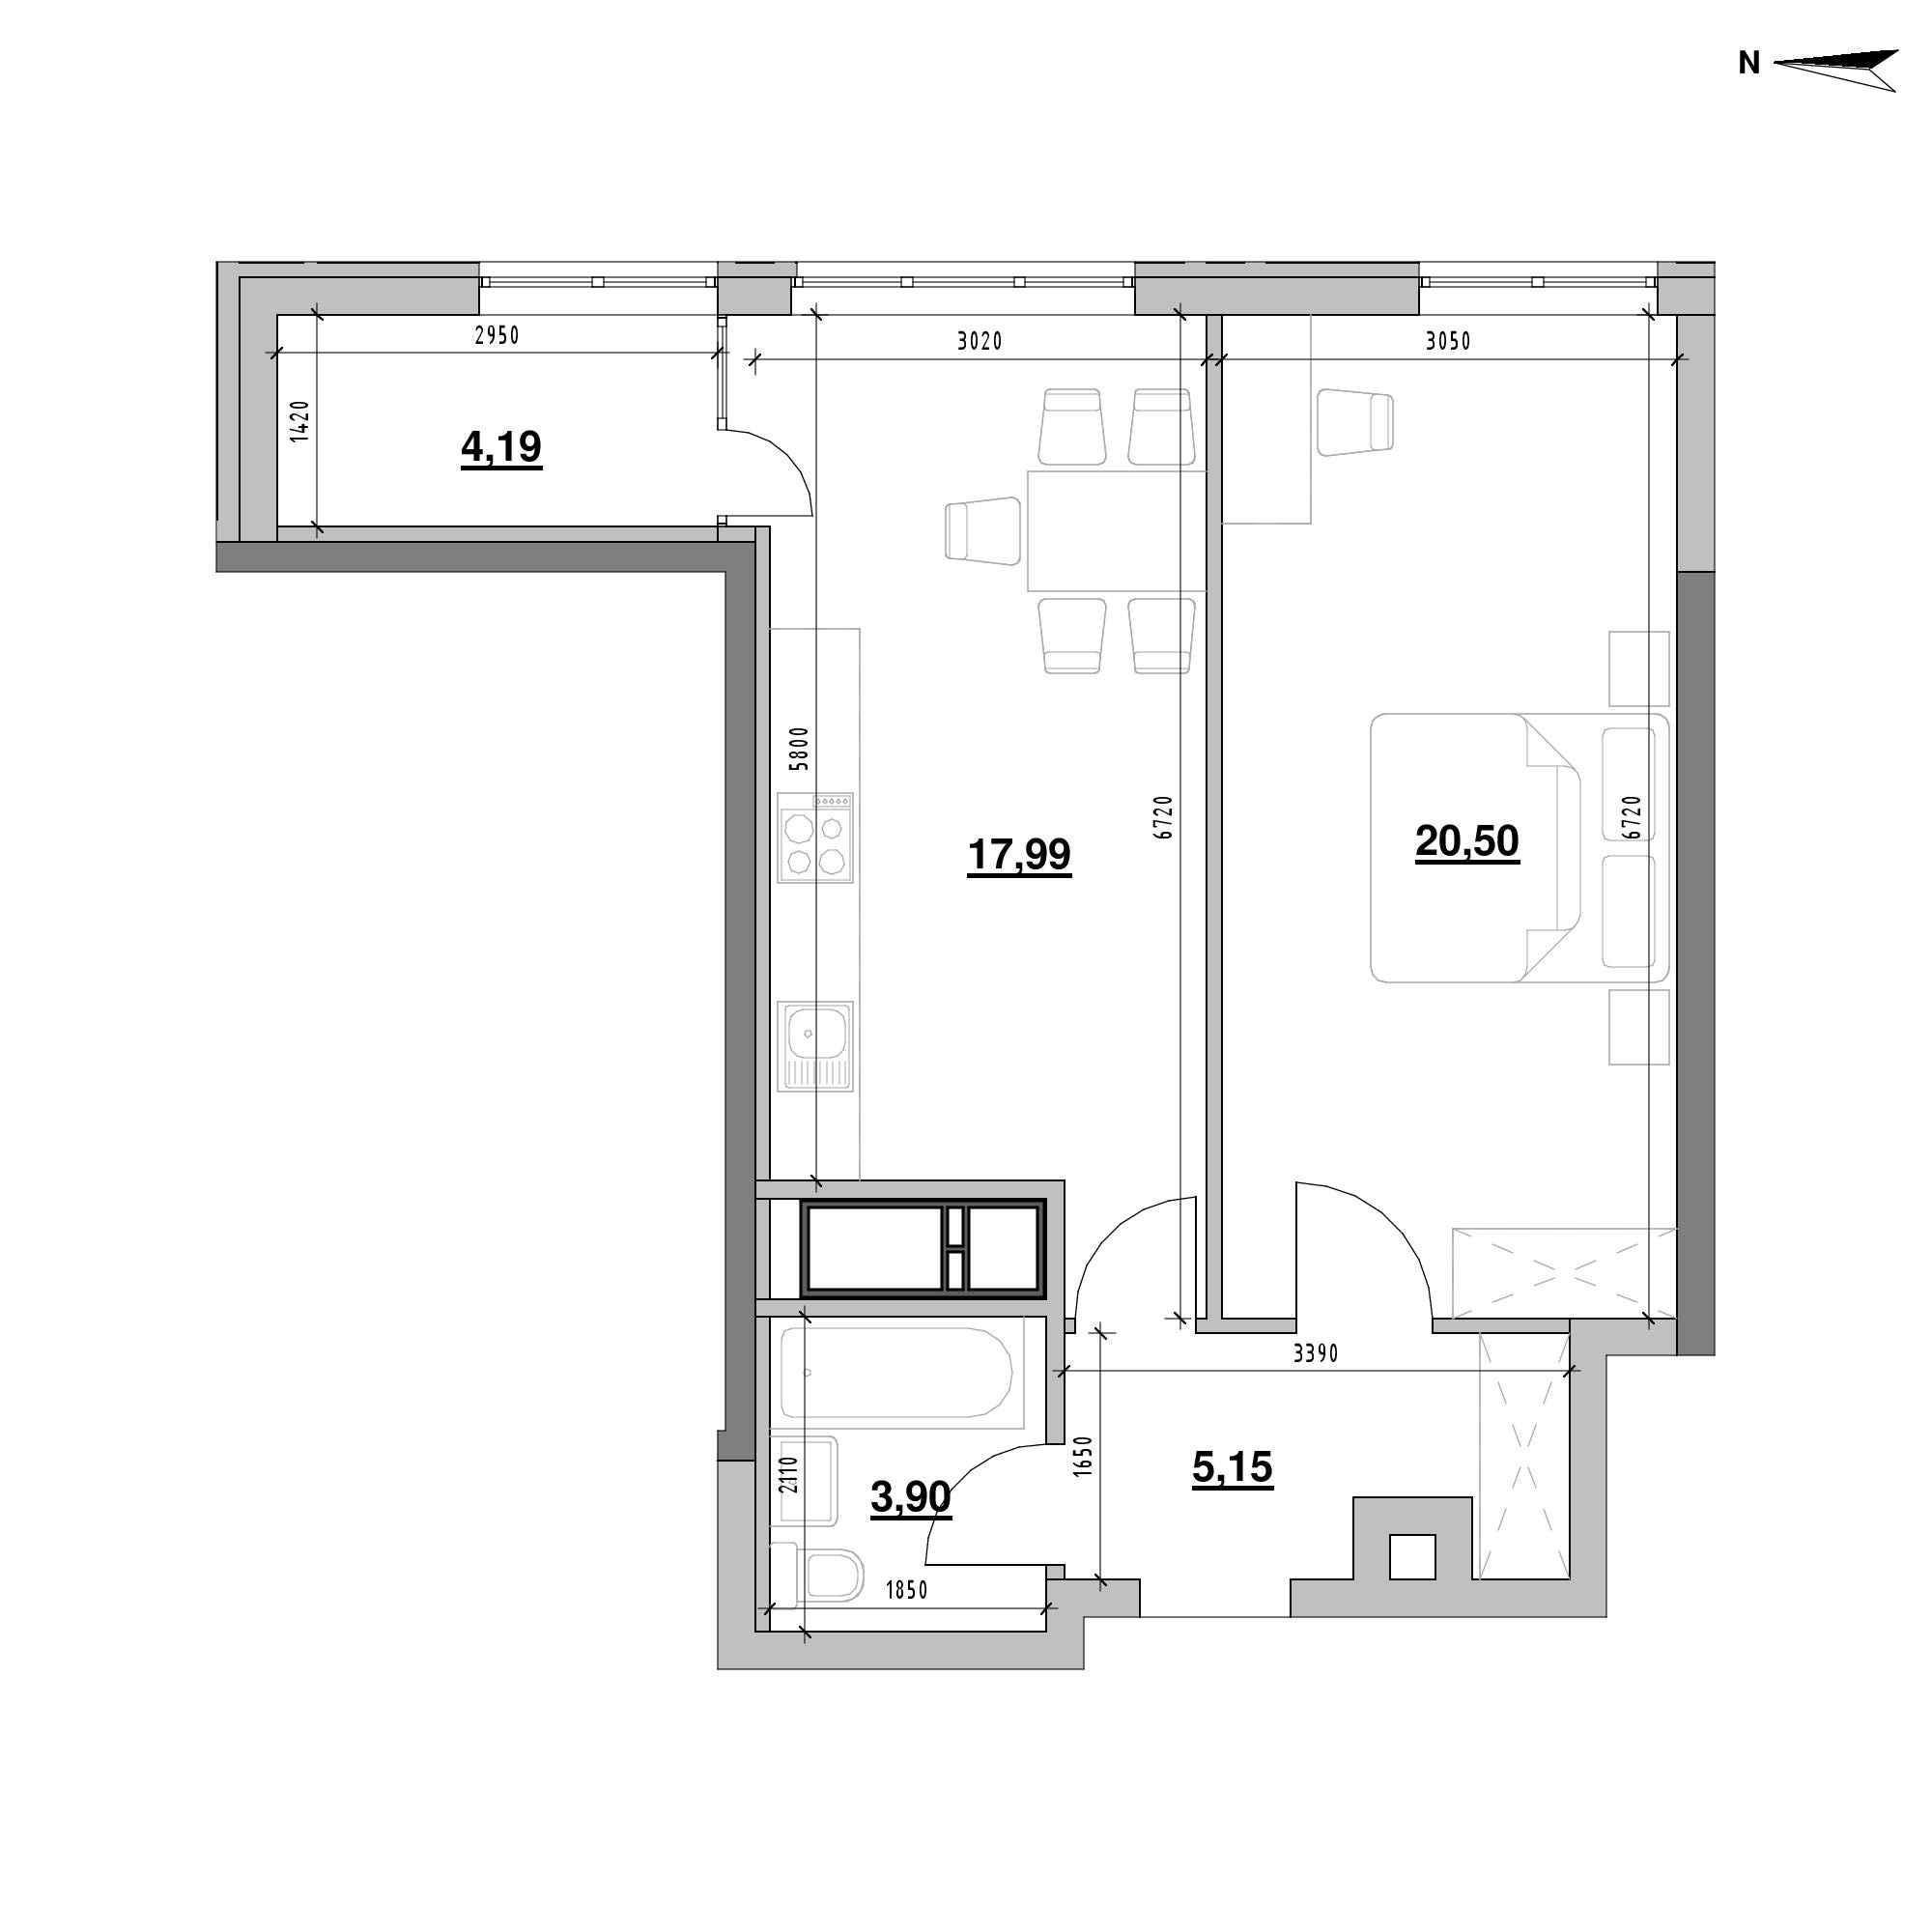 ЖК Nordica Residence: планування 1-кімнатної квартири, №190, 51.73 м<sup>2</sup>